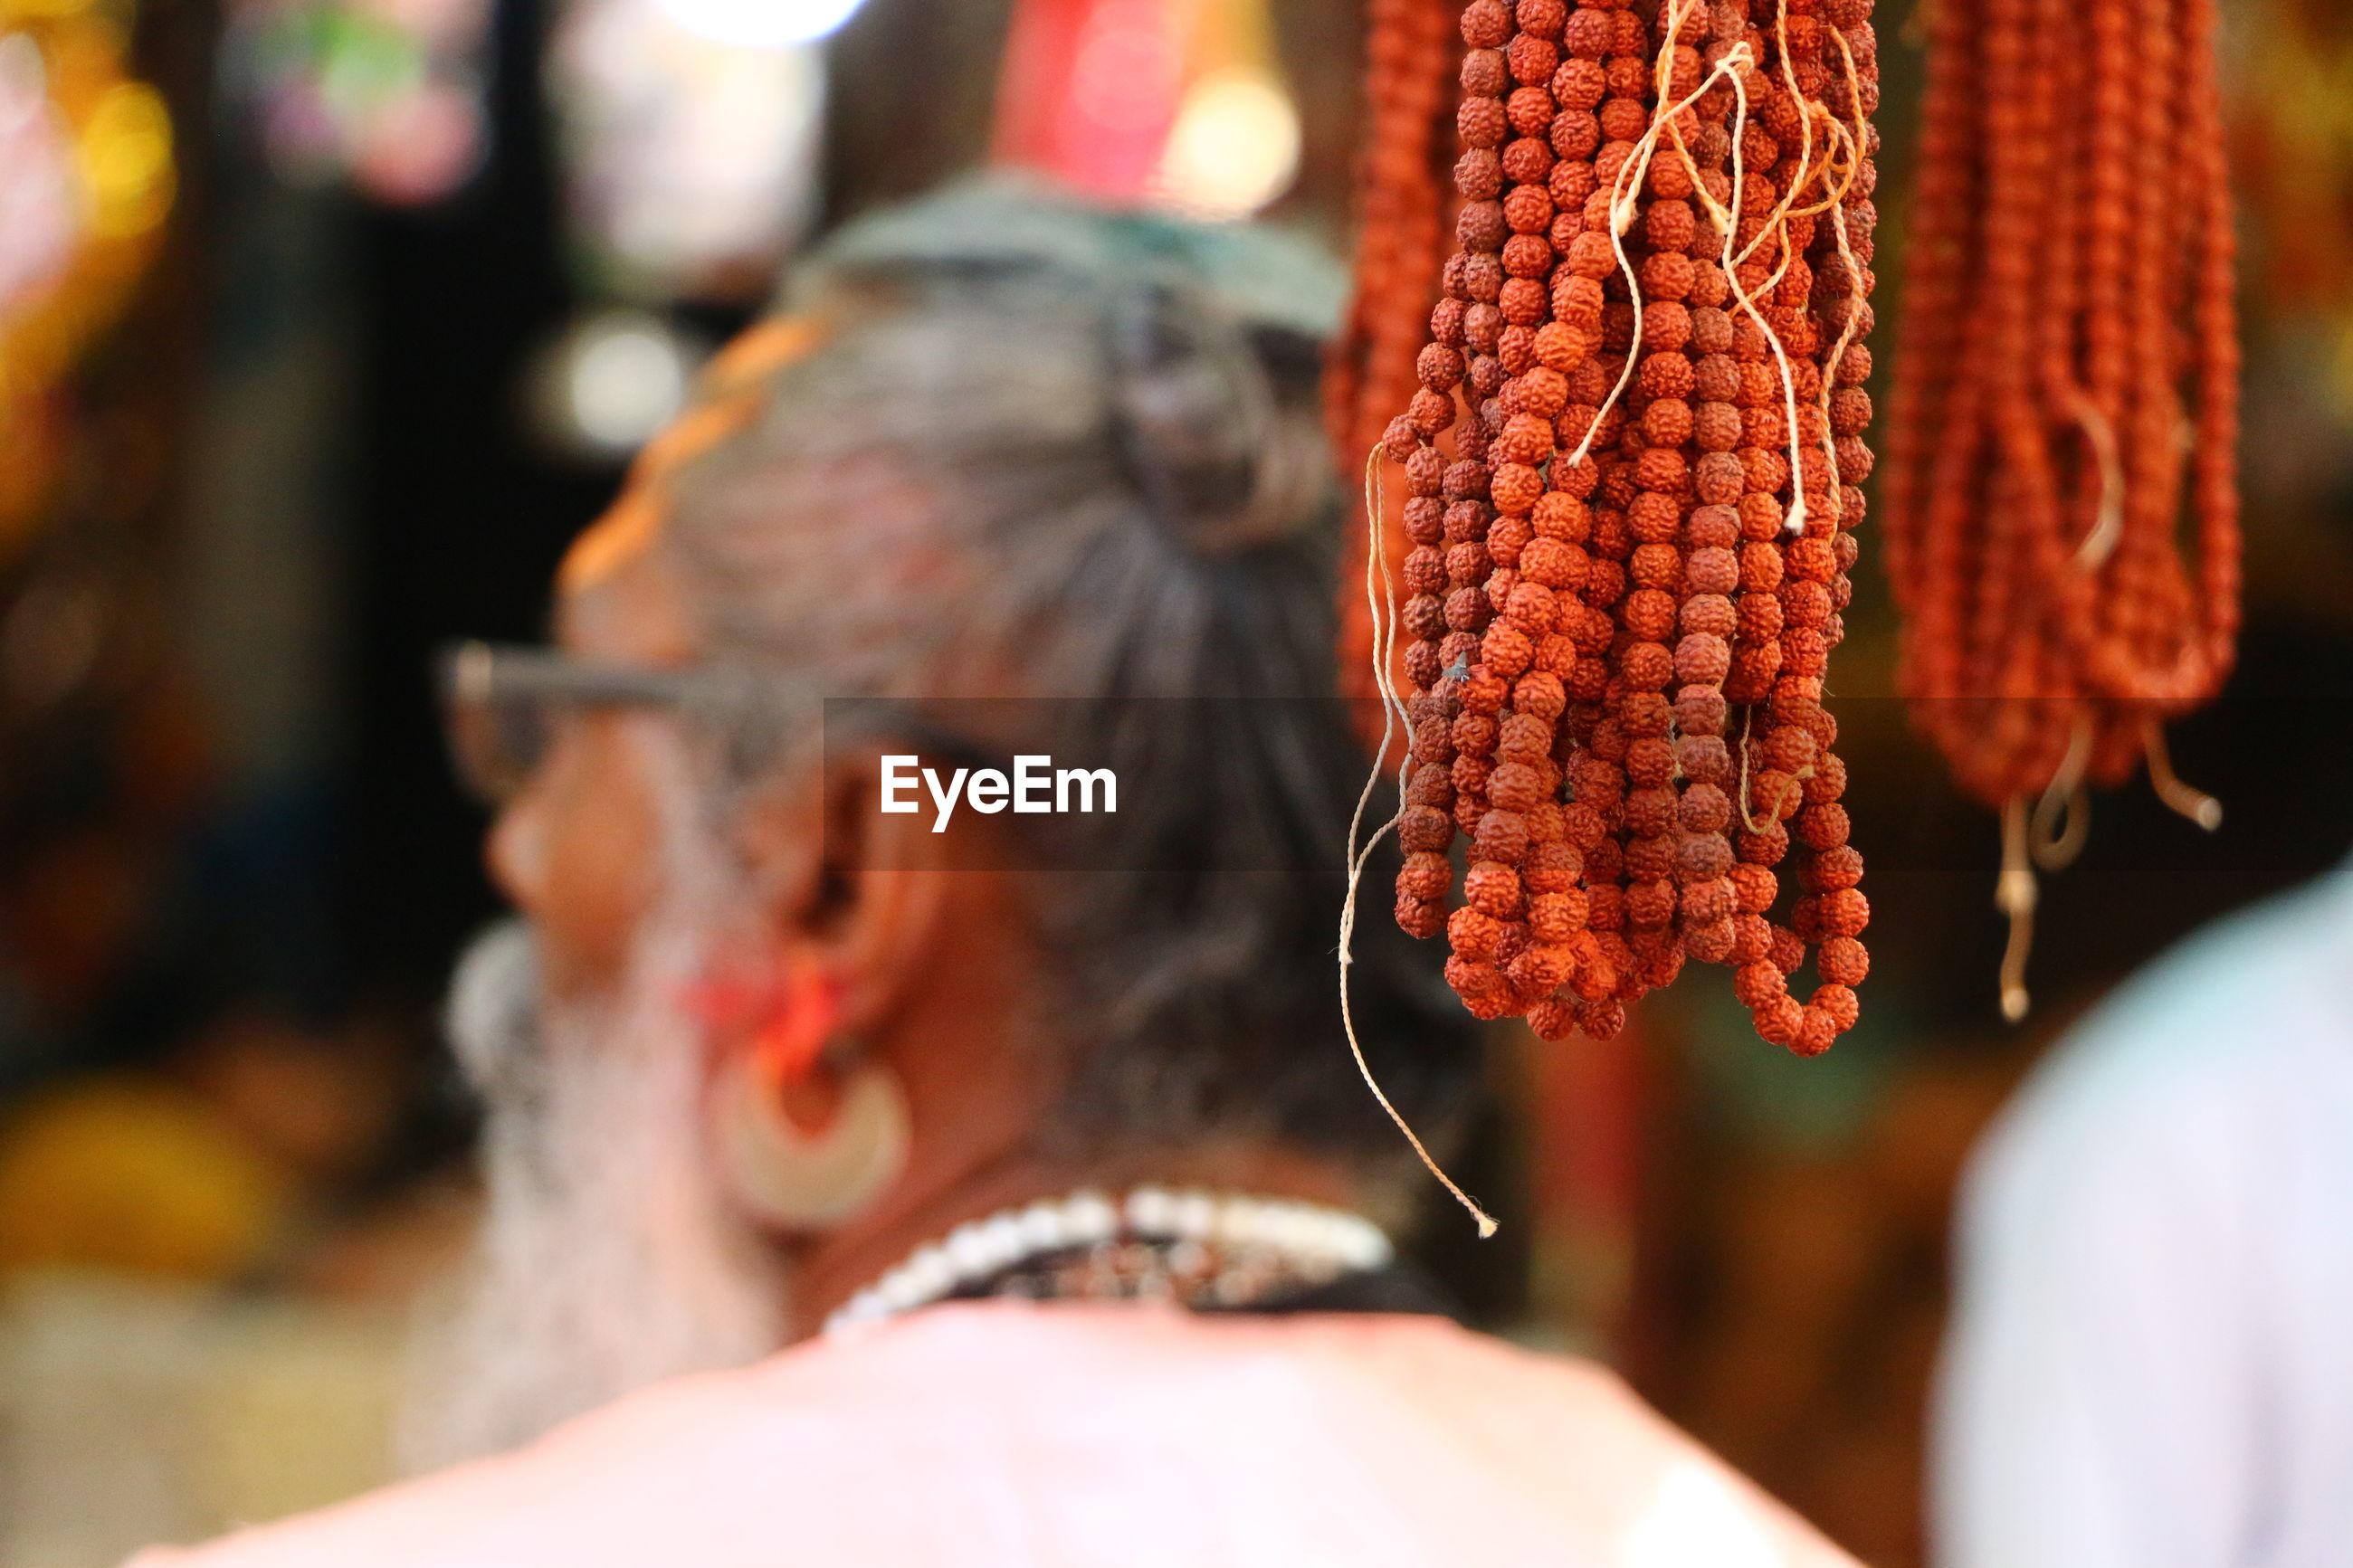 Close-up of rudraksha hanging at market stall with sadhu in background